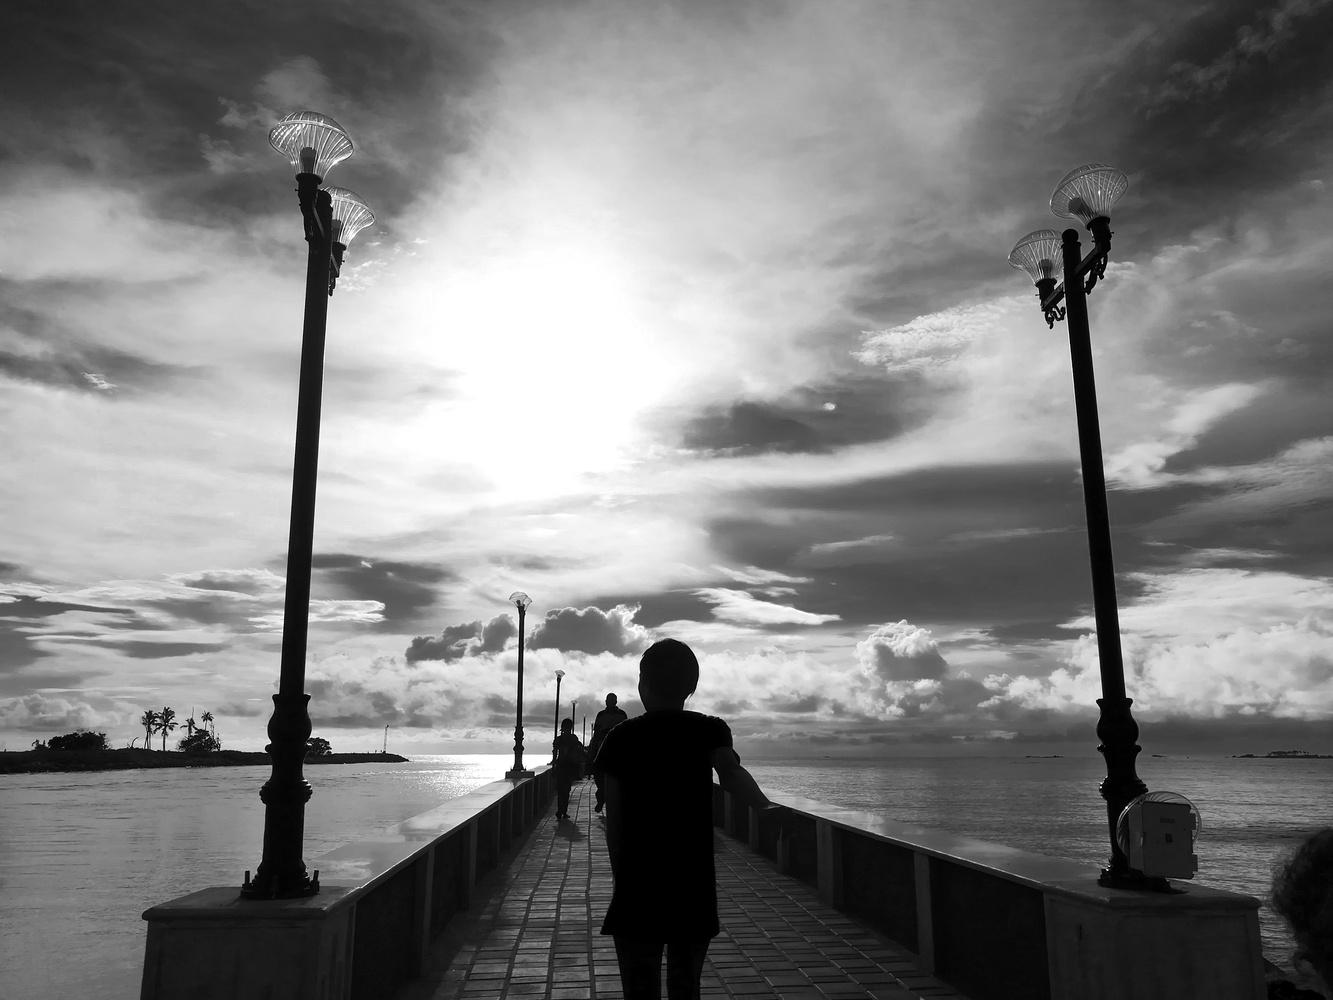 Monochrome by Utsav Nikte